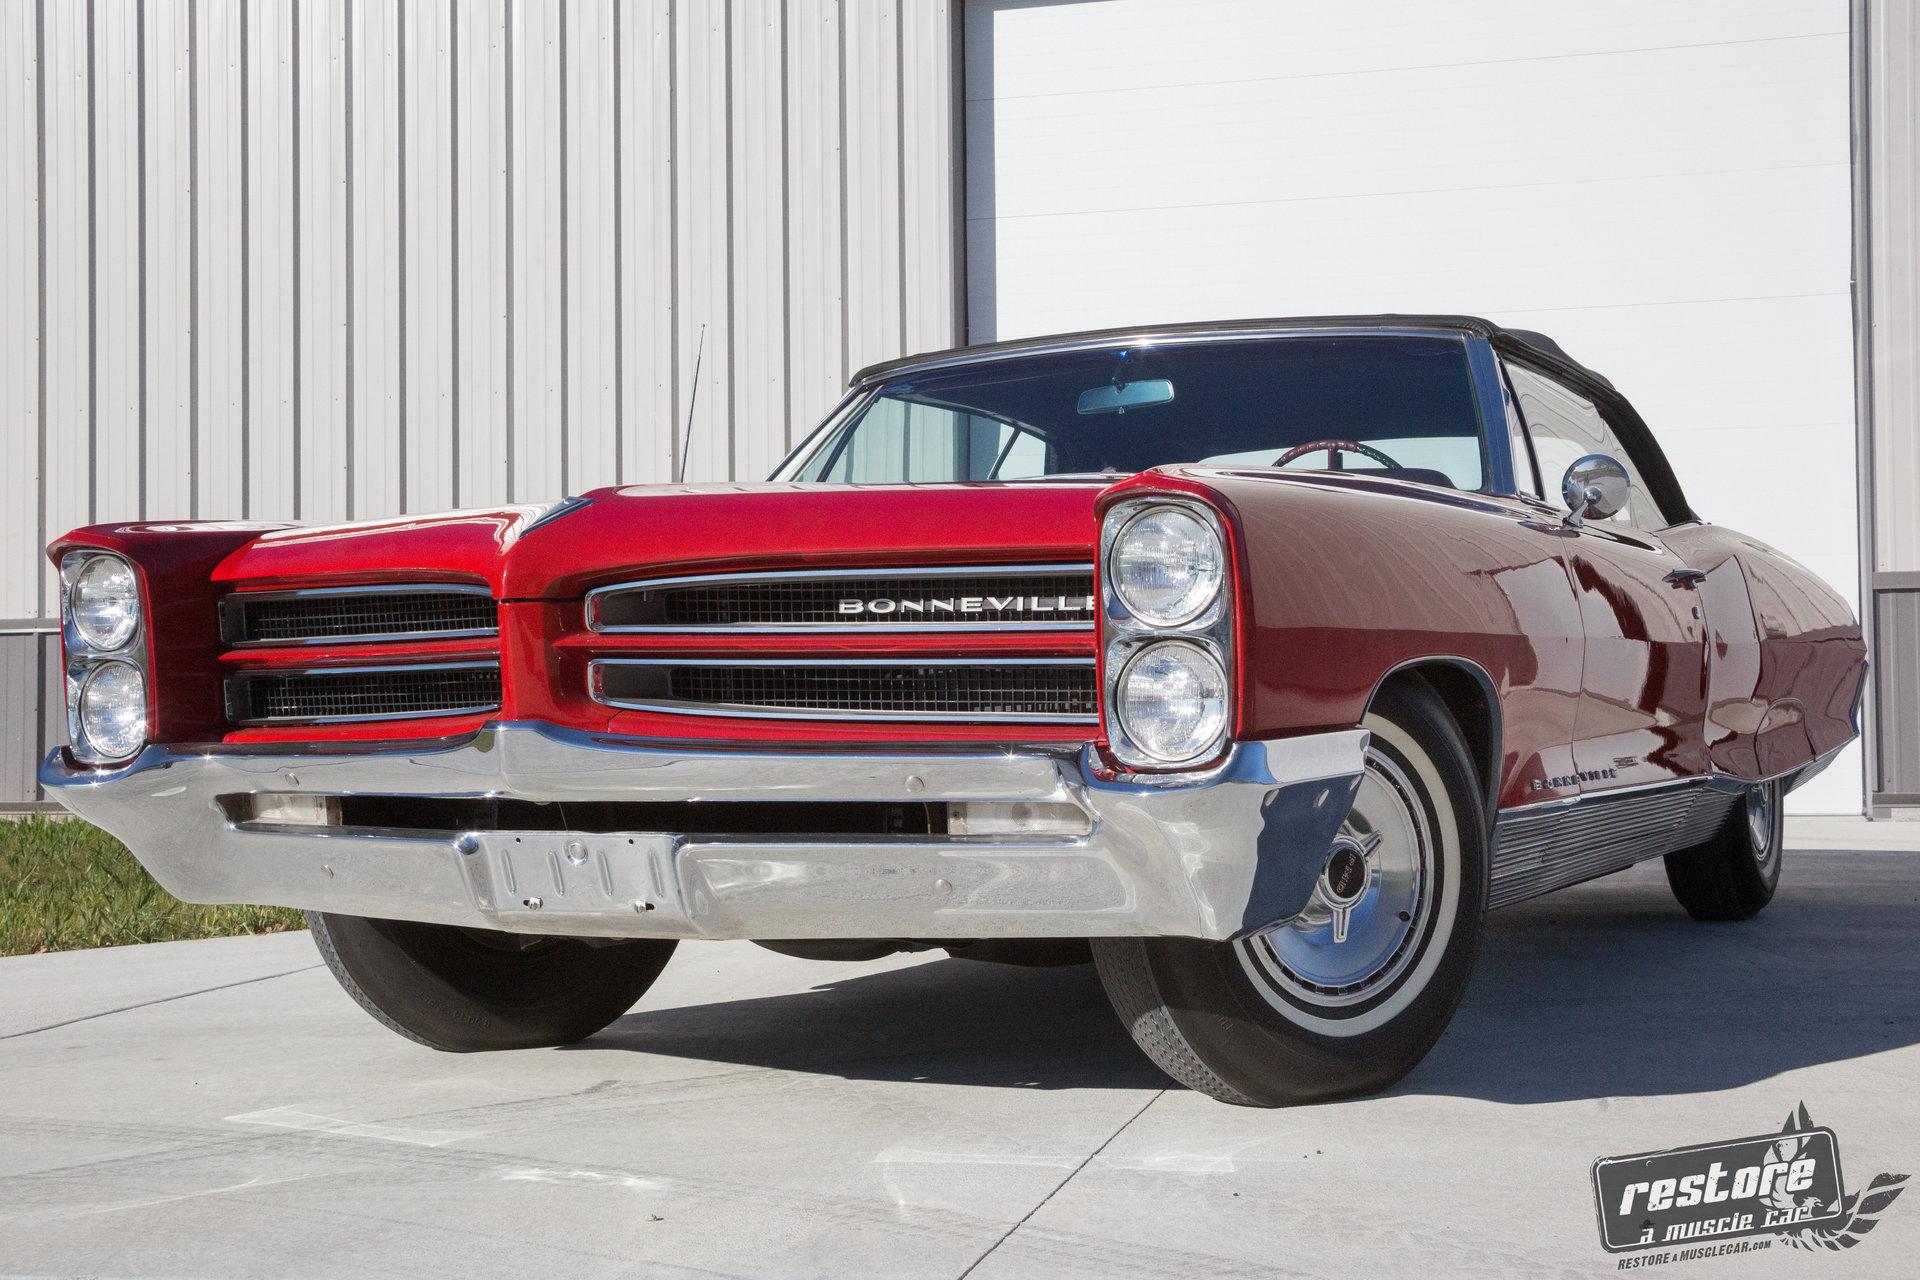 1966 pontiac bonneville restore a muscle car llc. Black Bedroom Furniture Sets. Home Design Ideas